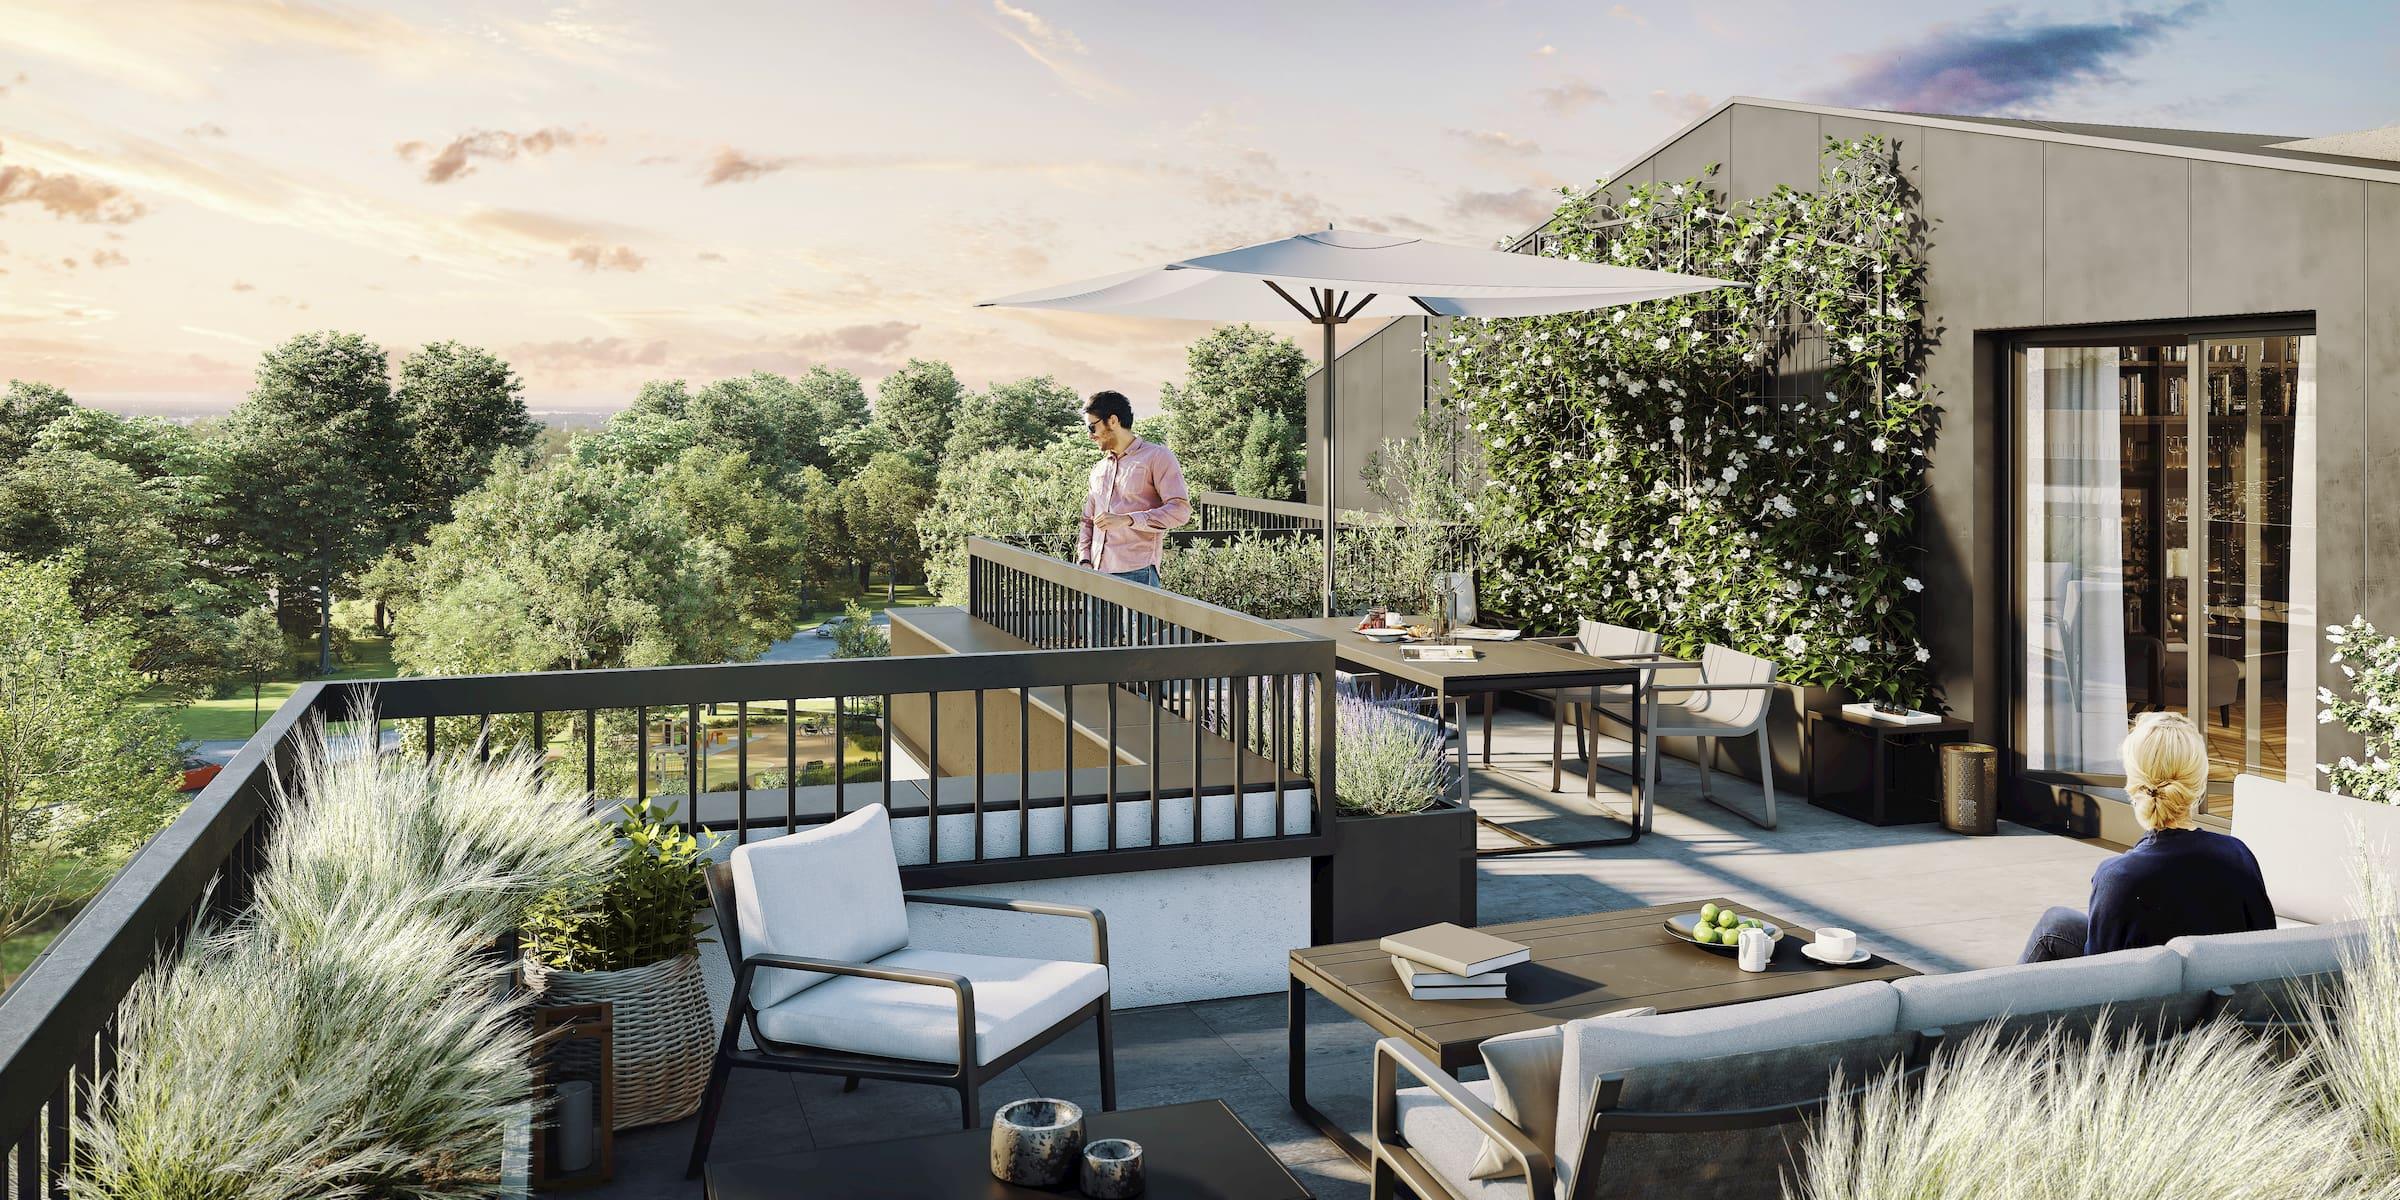 Housing estate in Warsaw Matexi 2016-2020